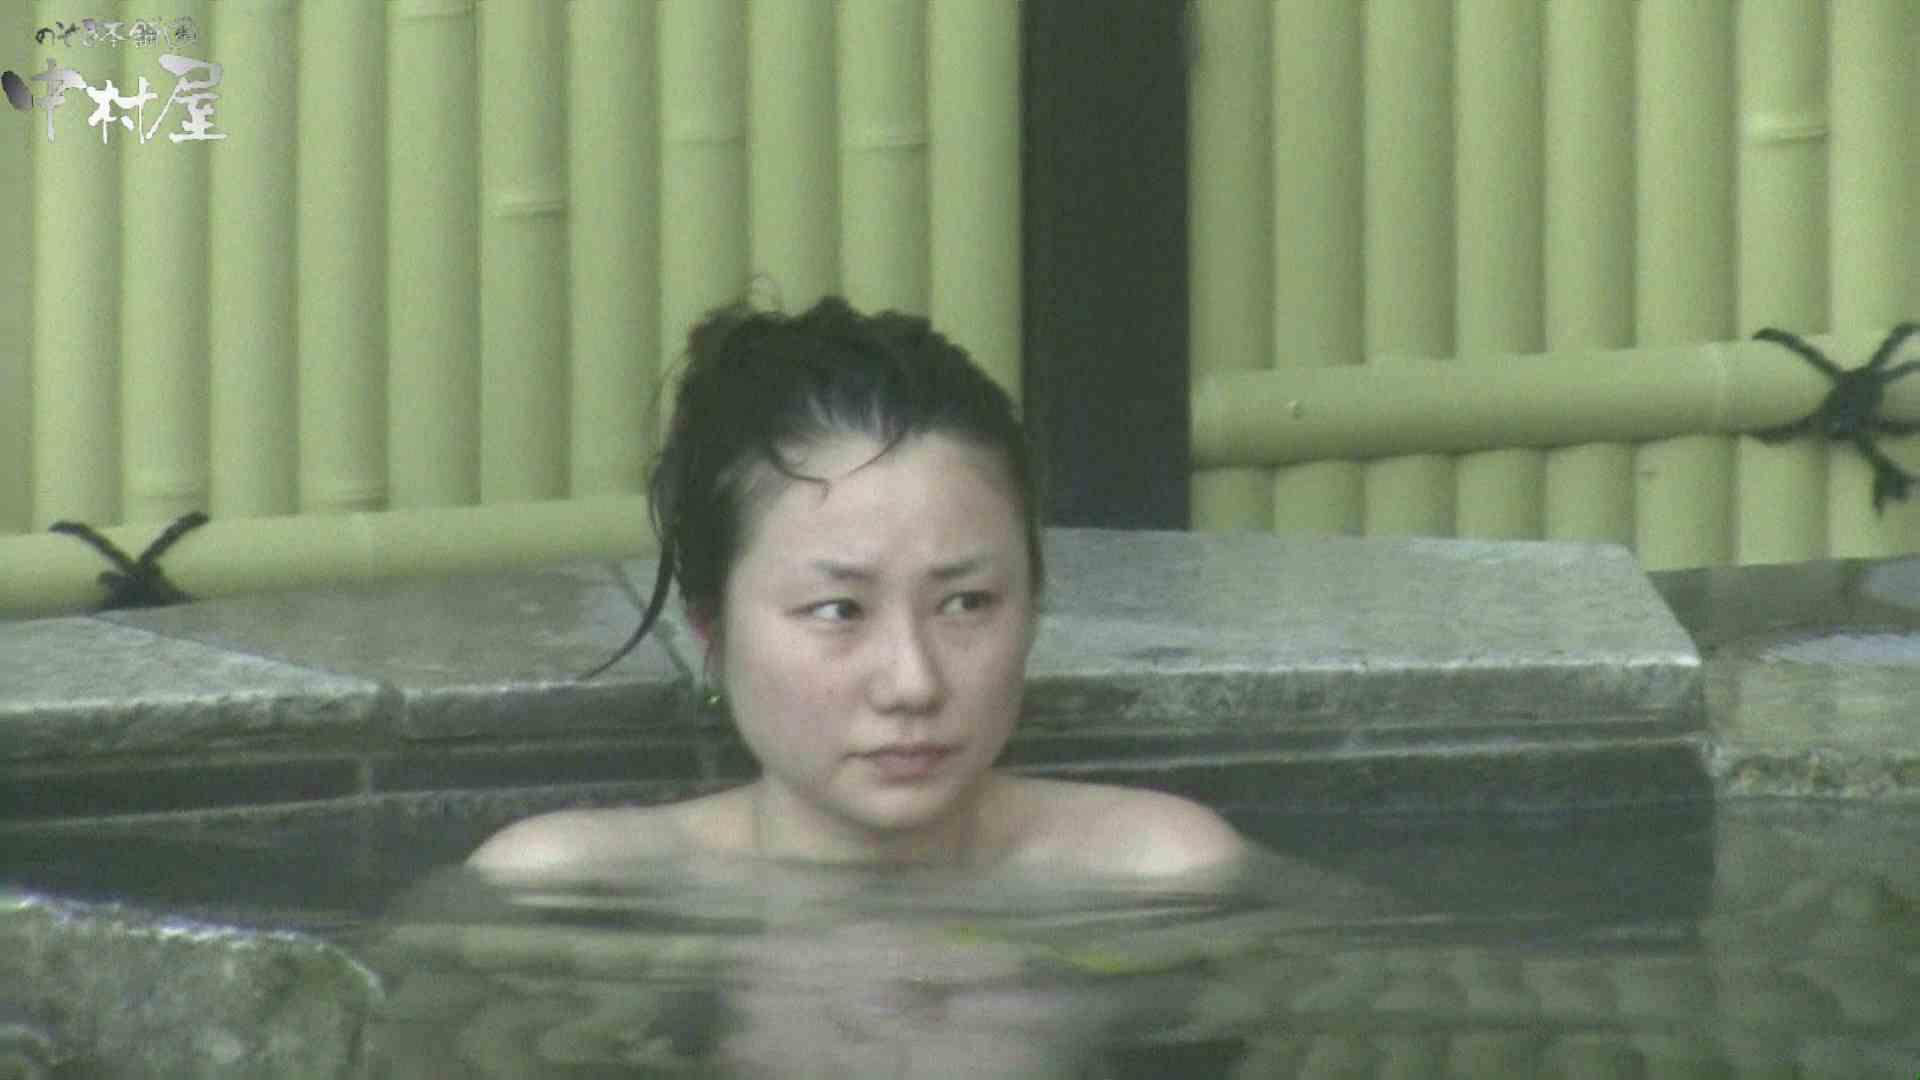 Aquaな露天風呂Vol.969 盗撮  86連発 9